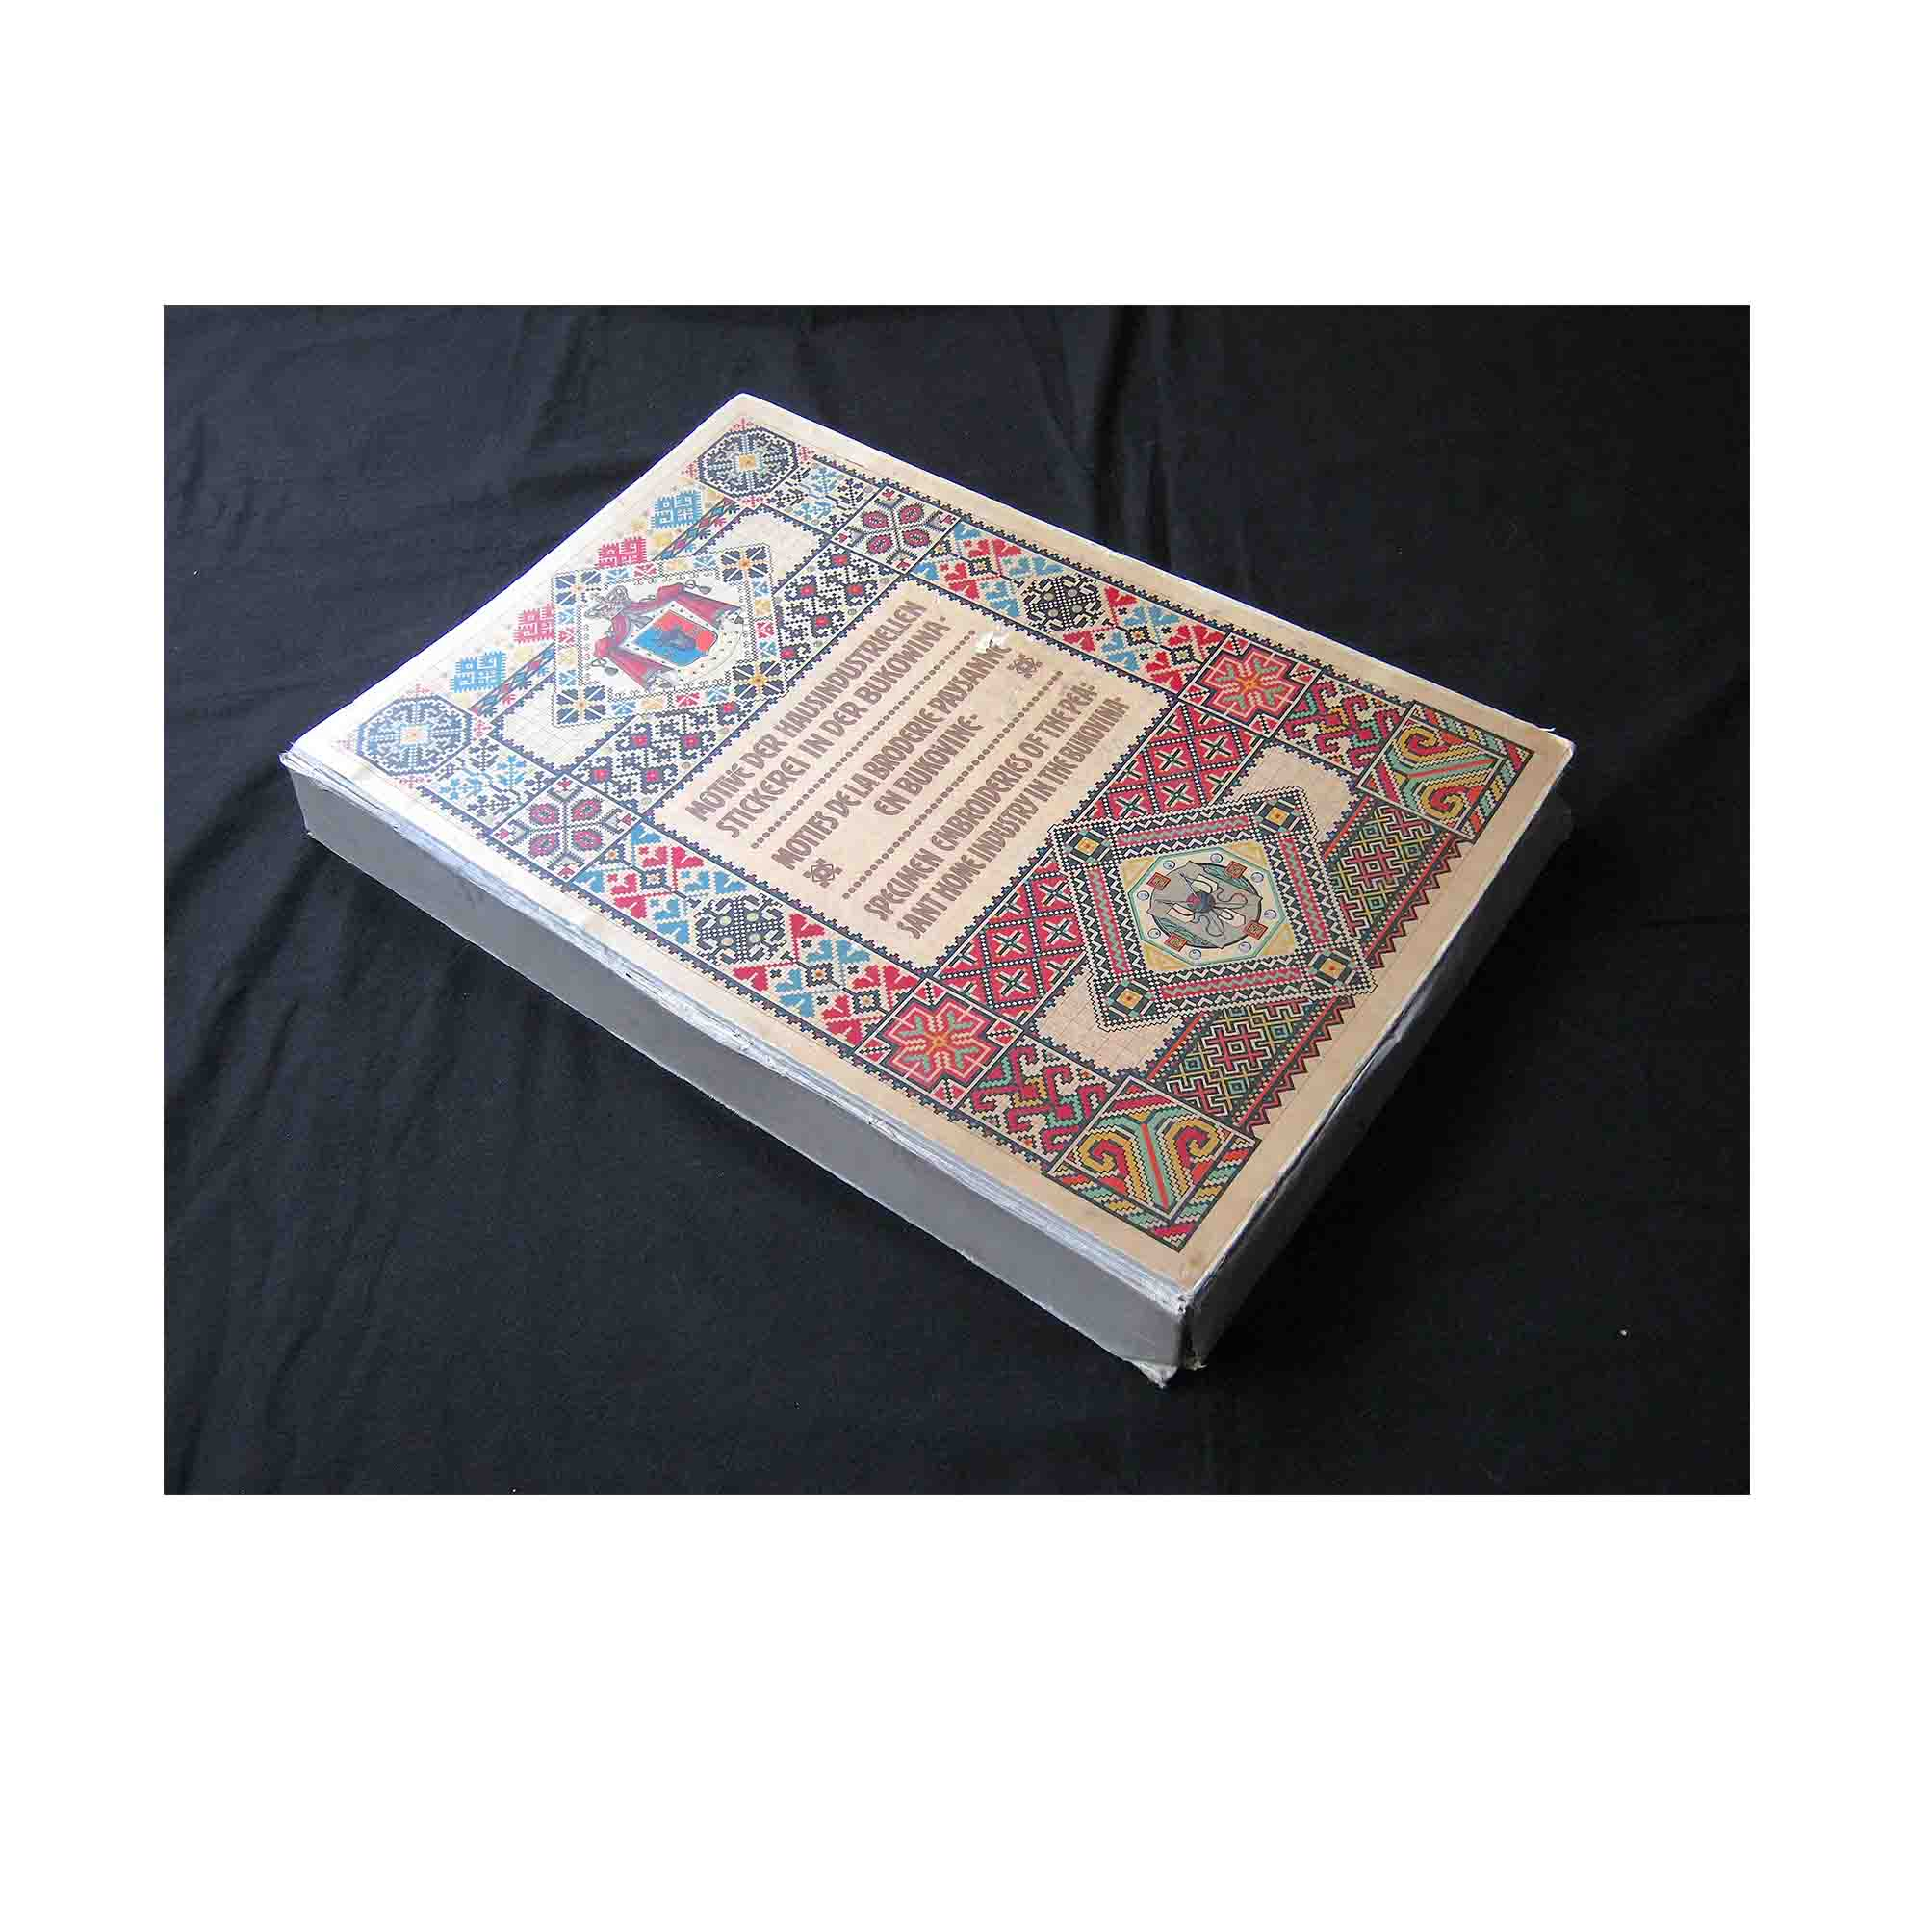 5709-Kolbenheyer-Stickerei-Bukowina-1912-Clamshell-Box-N.jpg